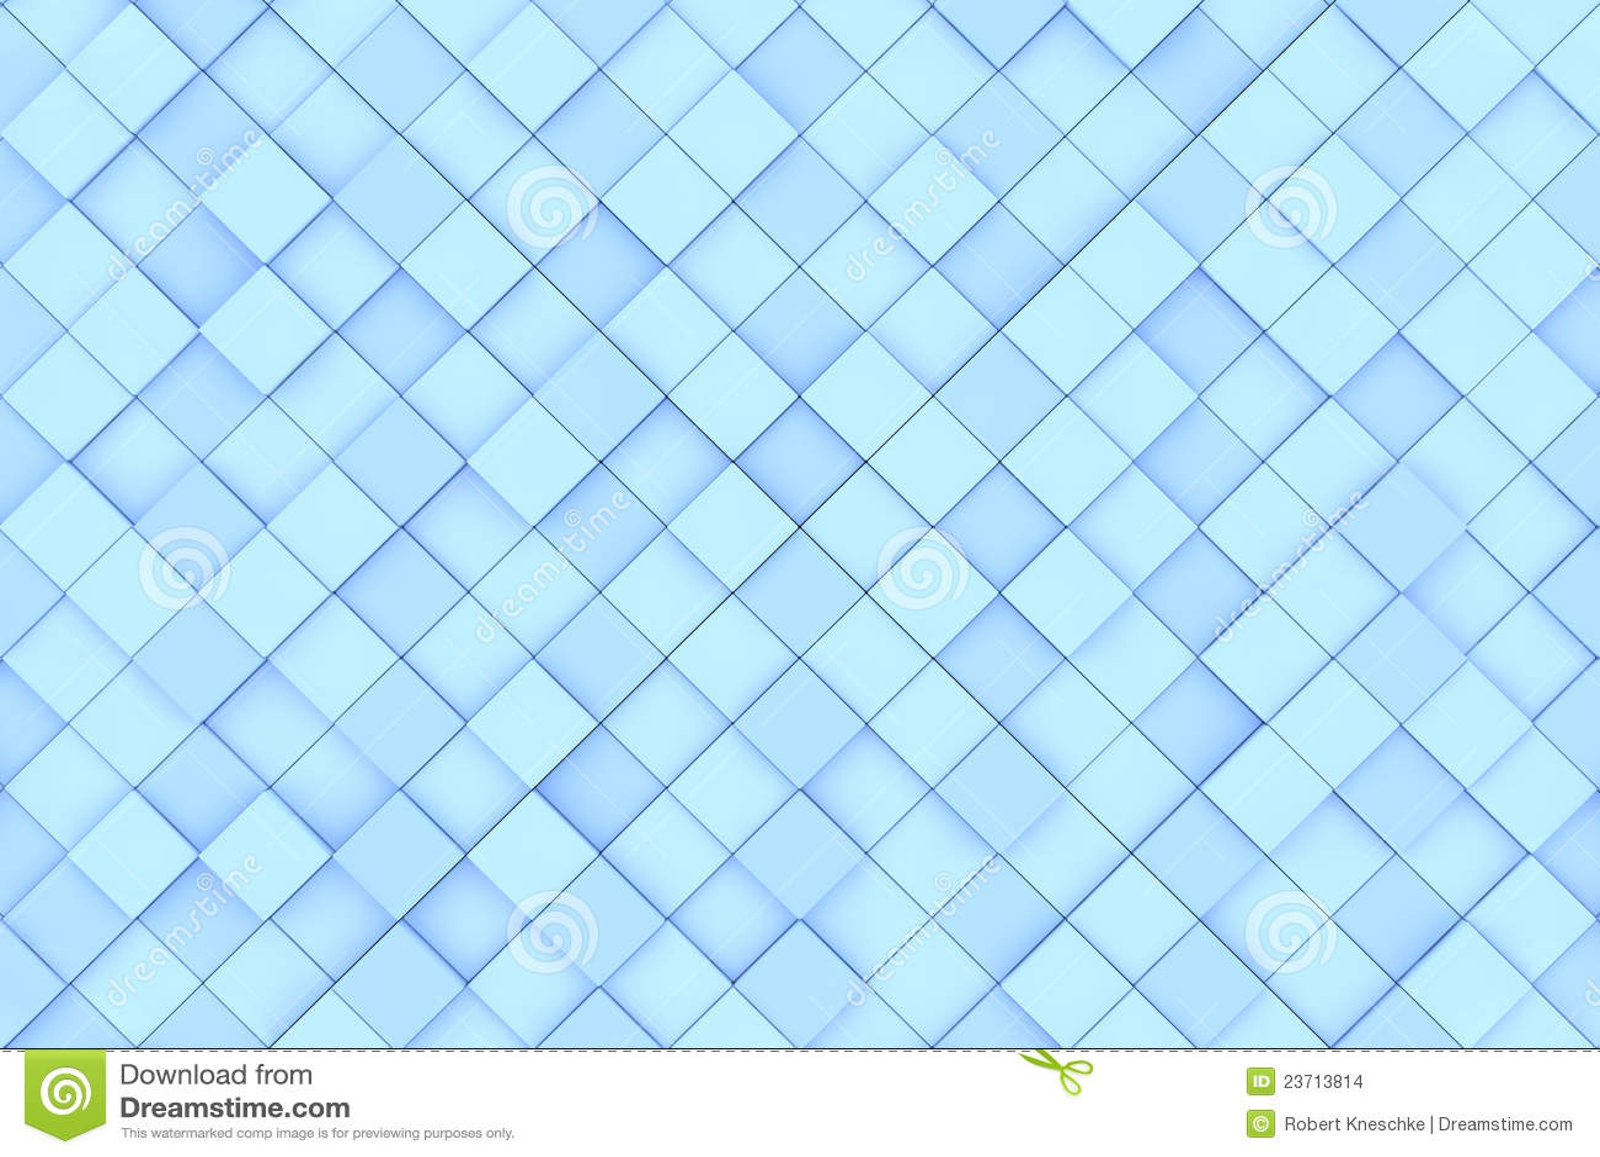 Blue square pattern background - photo#6